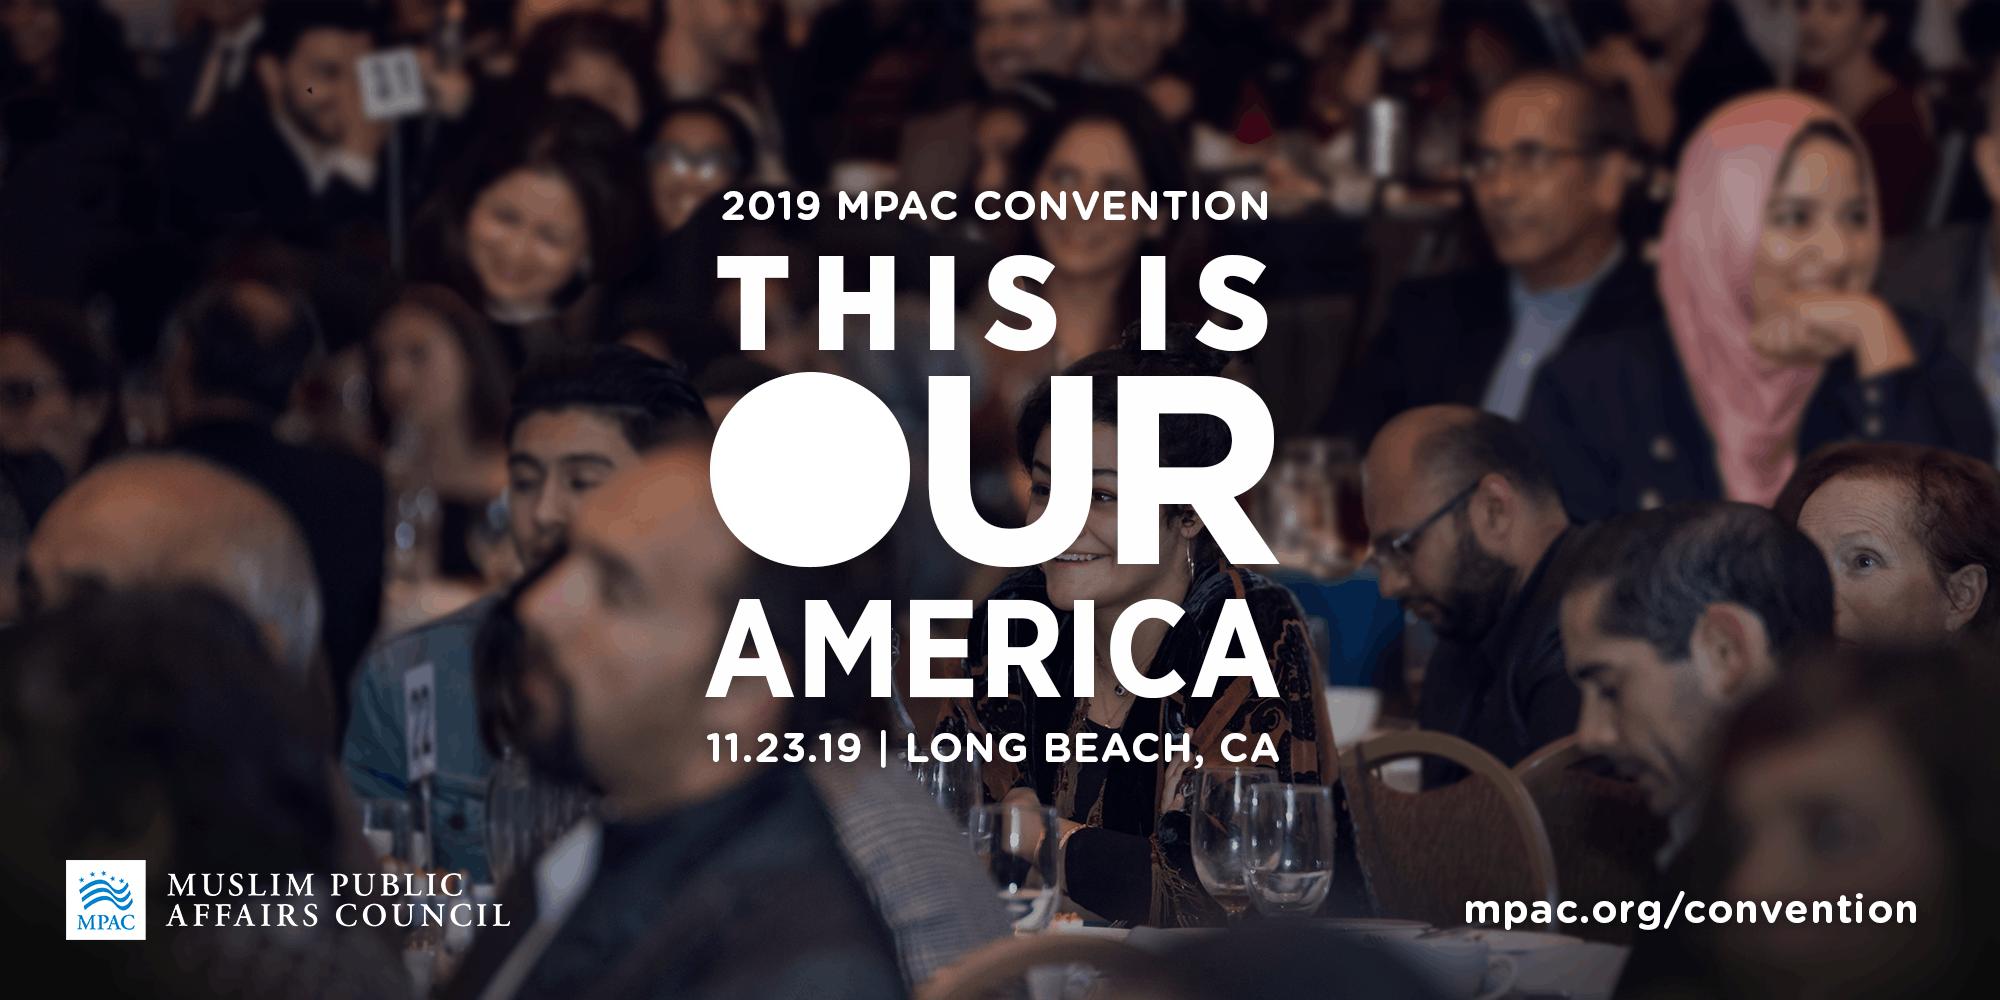 MPAC Convention 2019